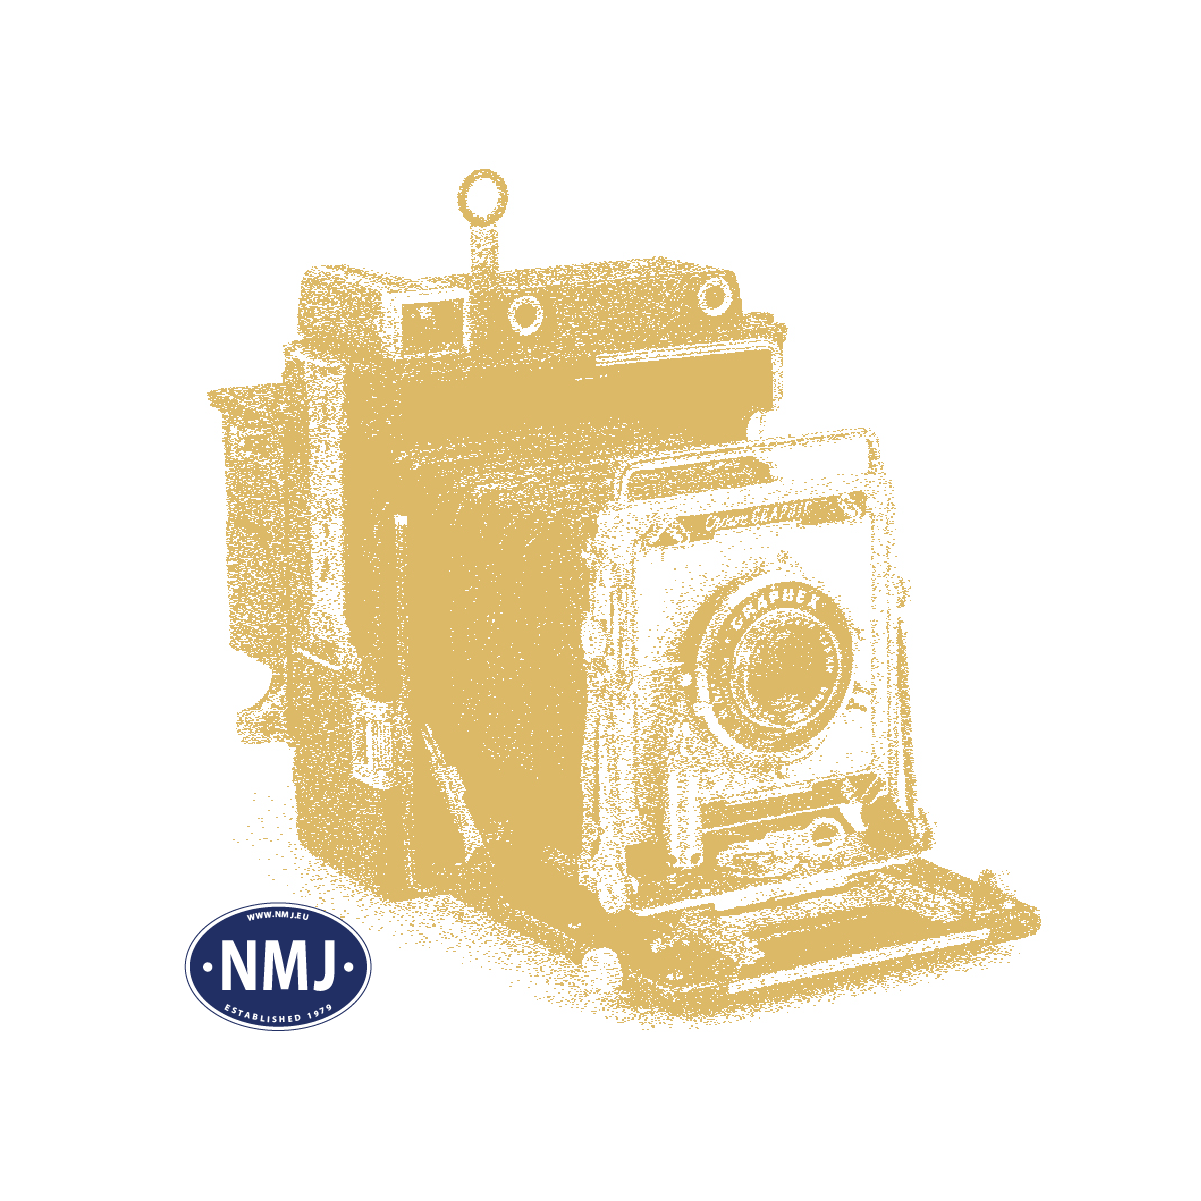 NMJT199.102 - NMJ Topline Bahnreisende sitzend, Set #2